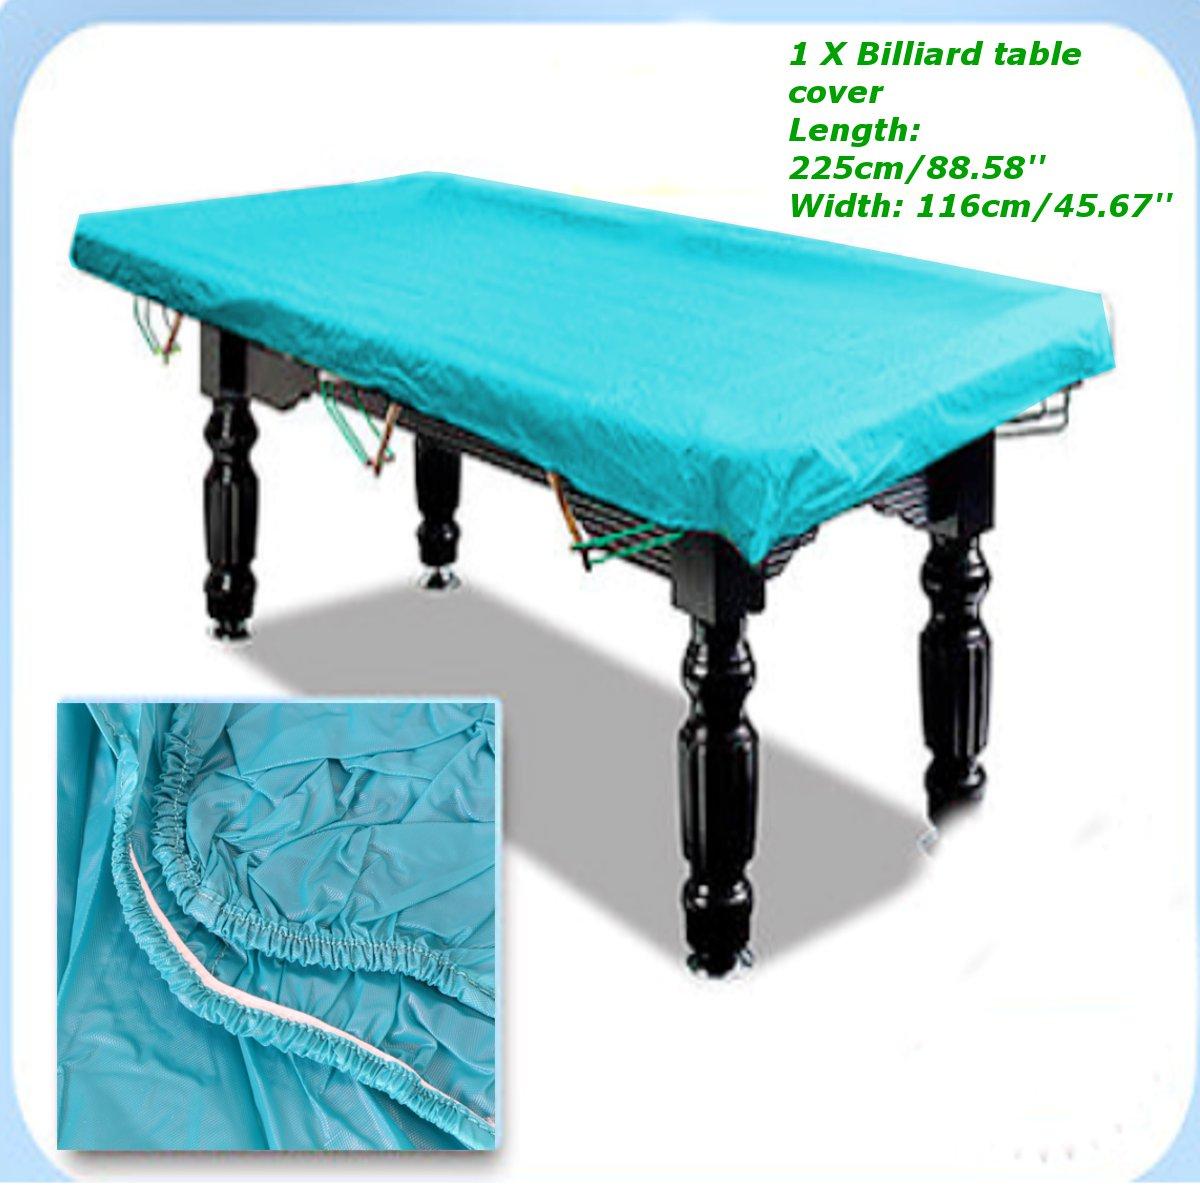 Attractive 89u0027u0027 Rubber Waterproof Cover DustProof Cloth For 7ft Pool Snooker Billiard  Table